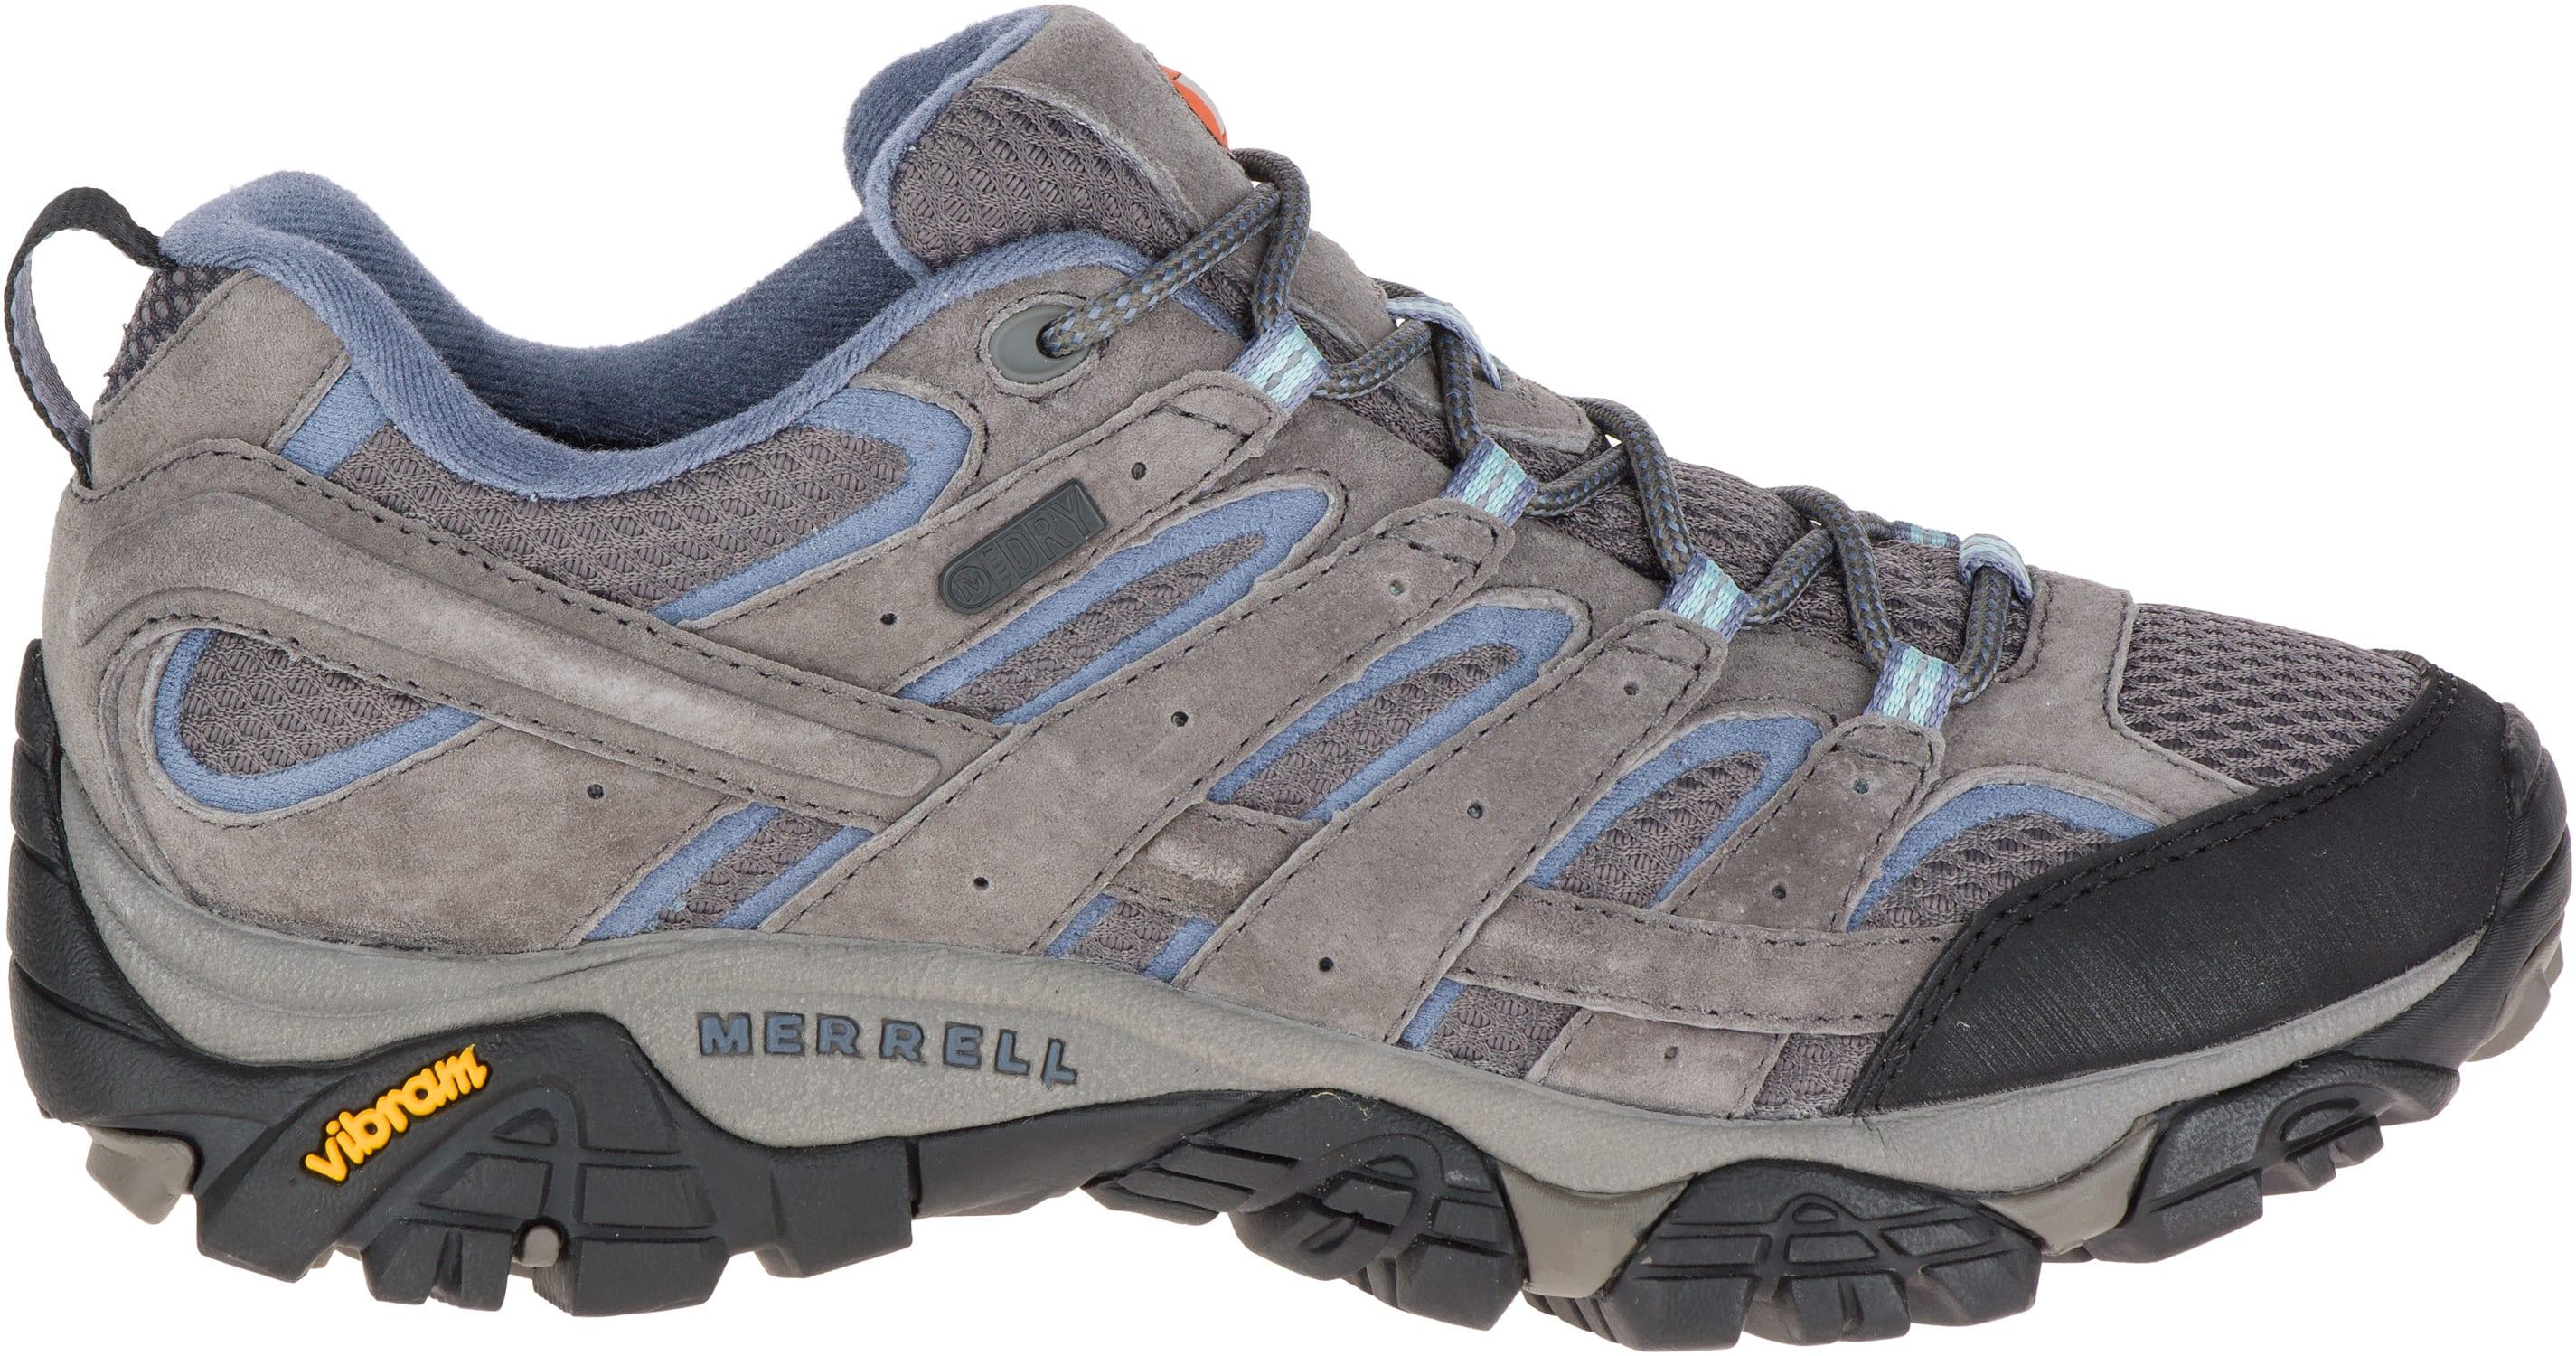 84447037a356 Merrell Moab 2 Waterproof Hiking Shoes Womens